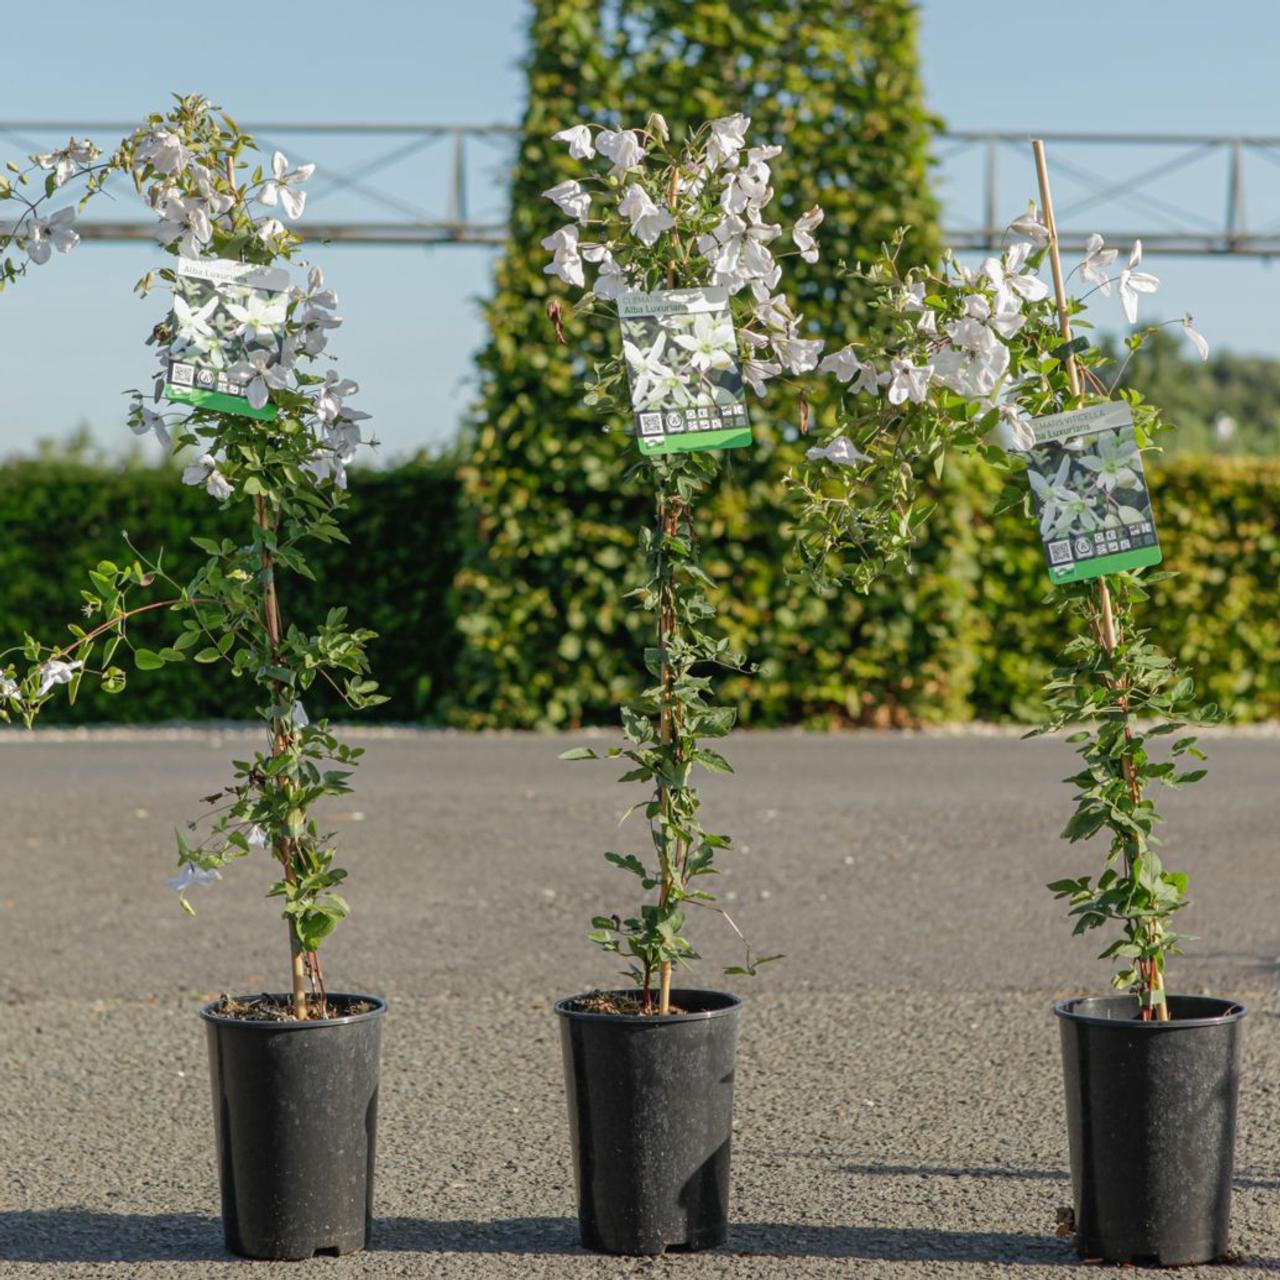 Clematis vitic. 'Alba Luxurians' plant